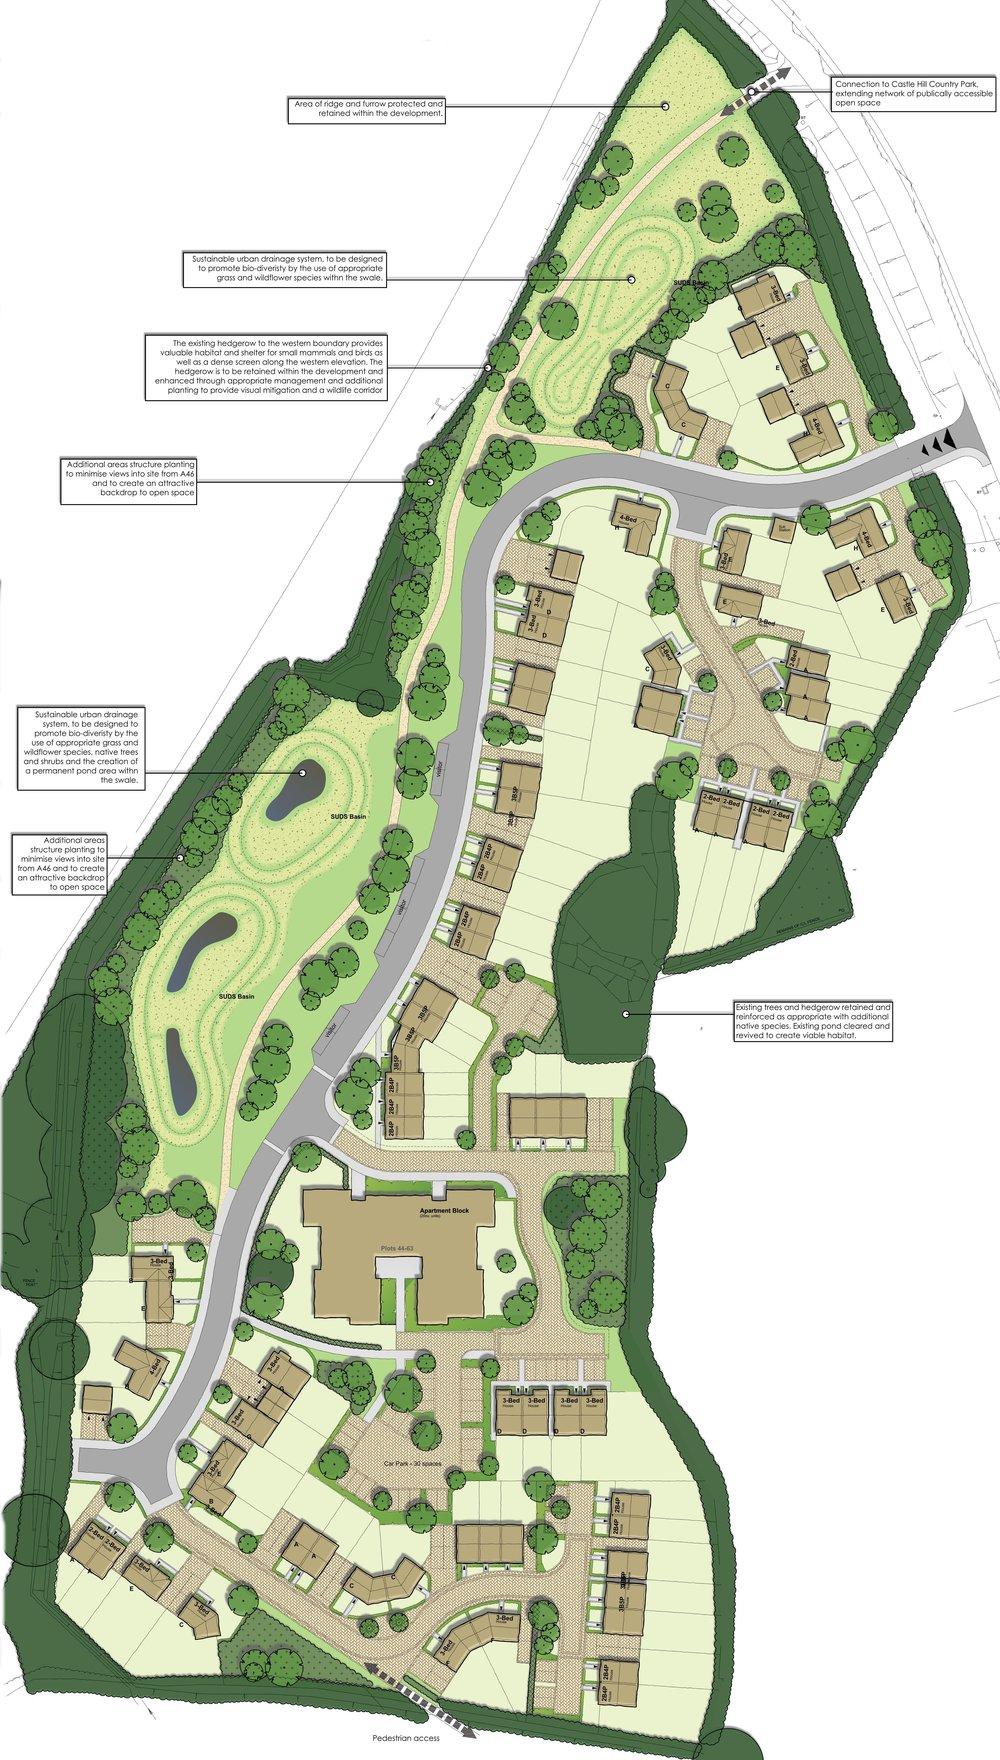 Gorse Hilll Landscape Strategy 29.05.18_Gorse Hill Landscape Strategy 2_Page_1.jpeg